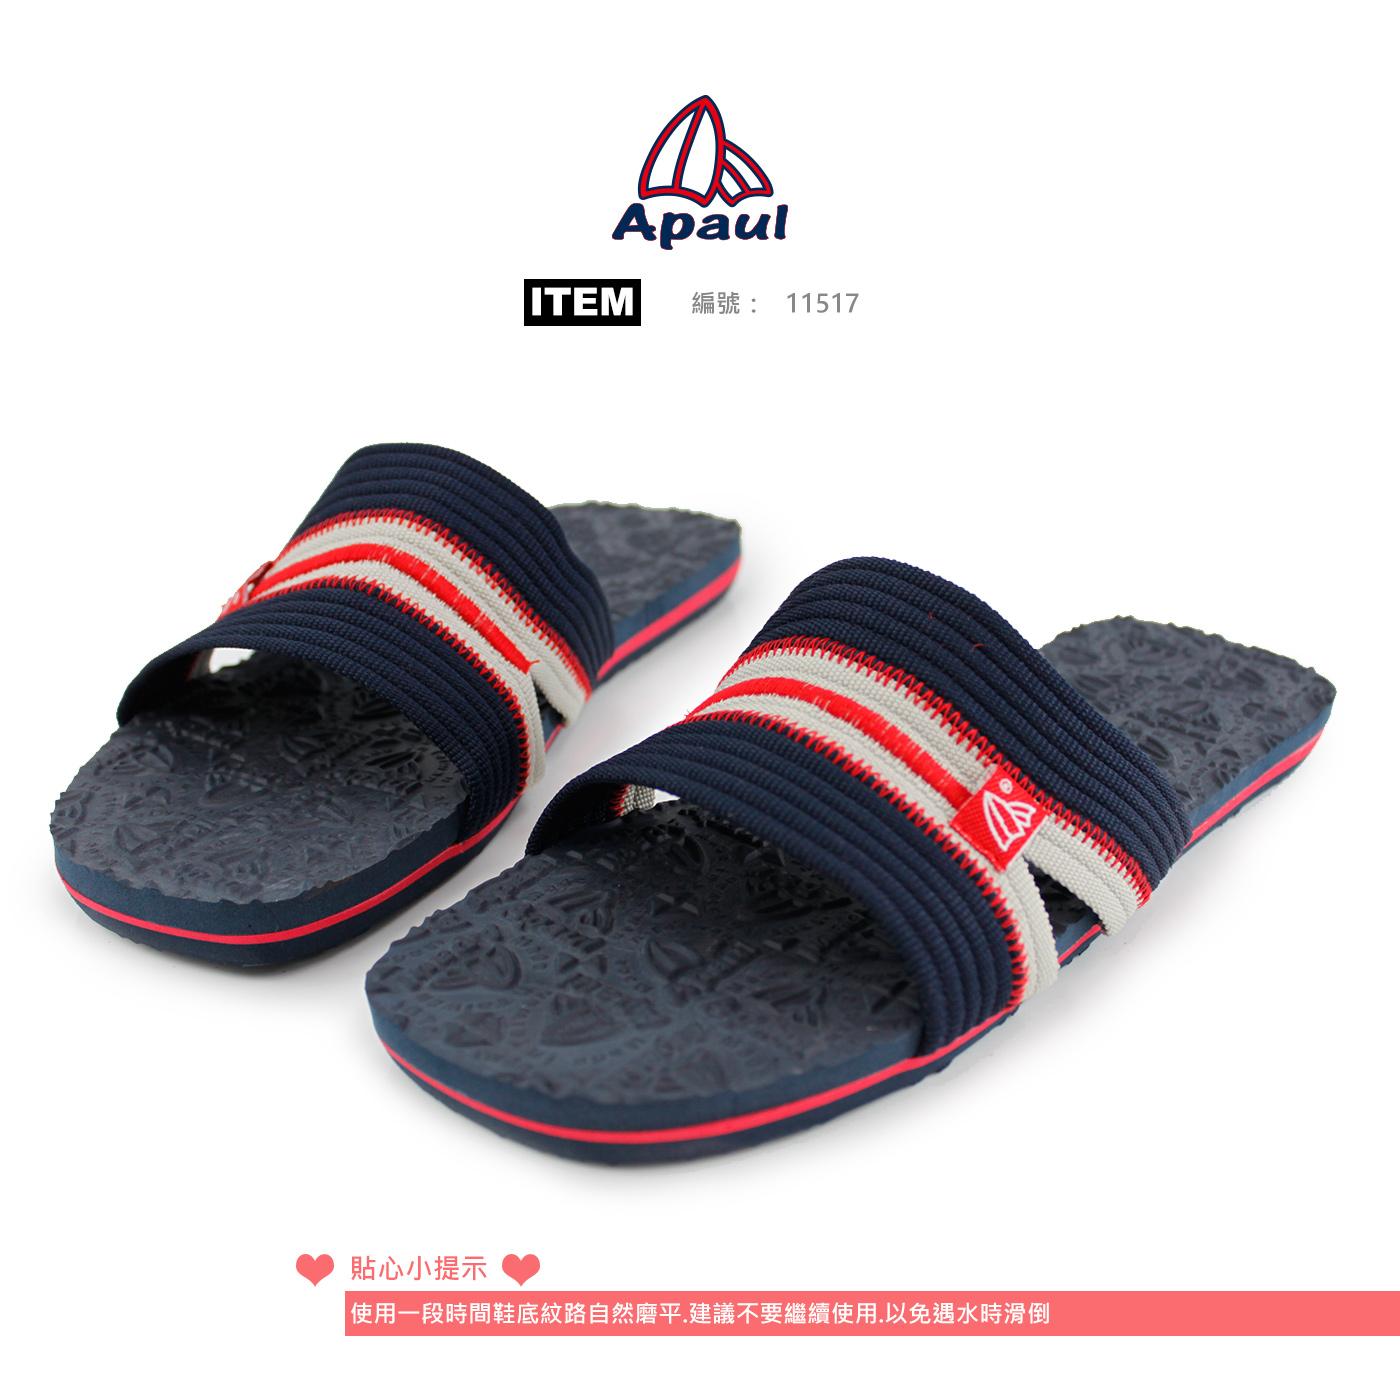 APAUL 品牌鞋 設計款 一片式橡膠拖鞋【11517灰藍】台灣製造